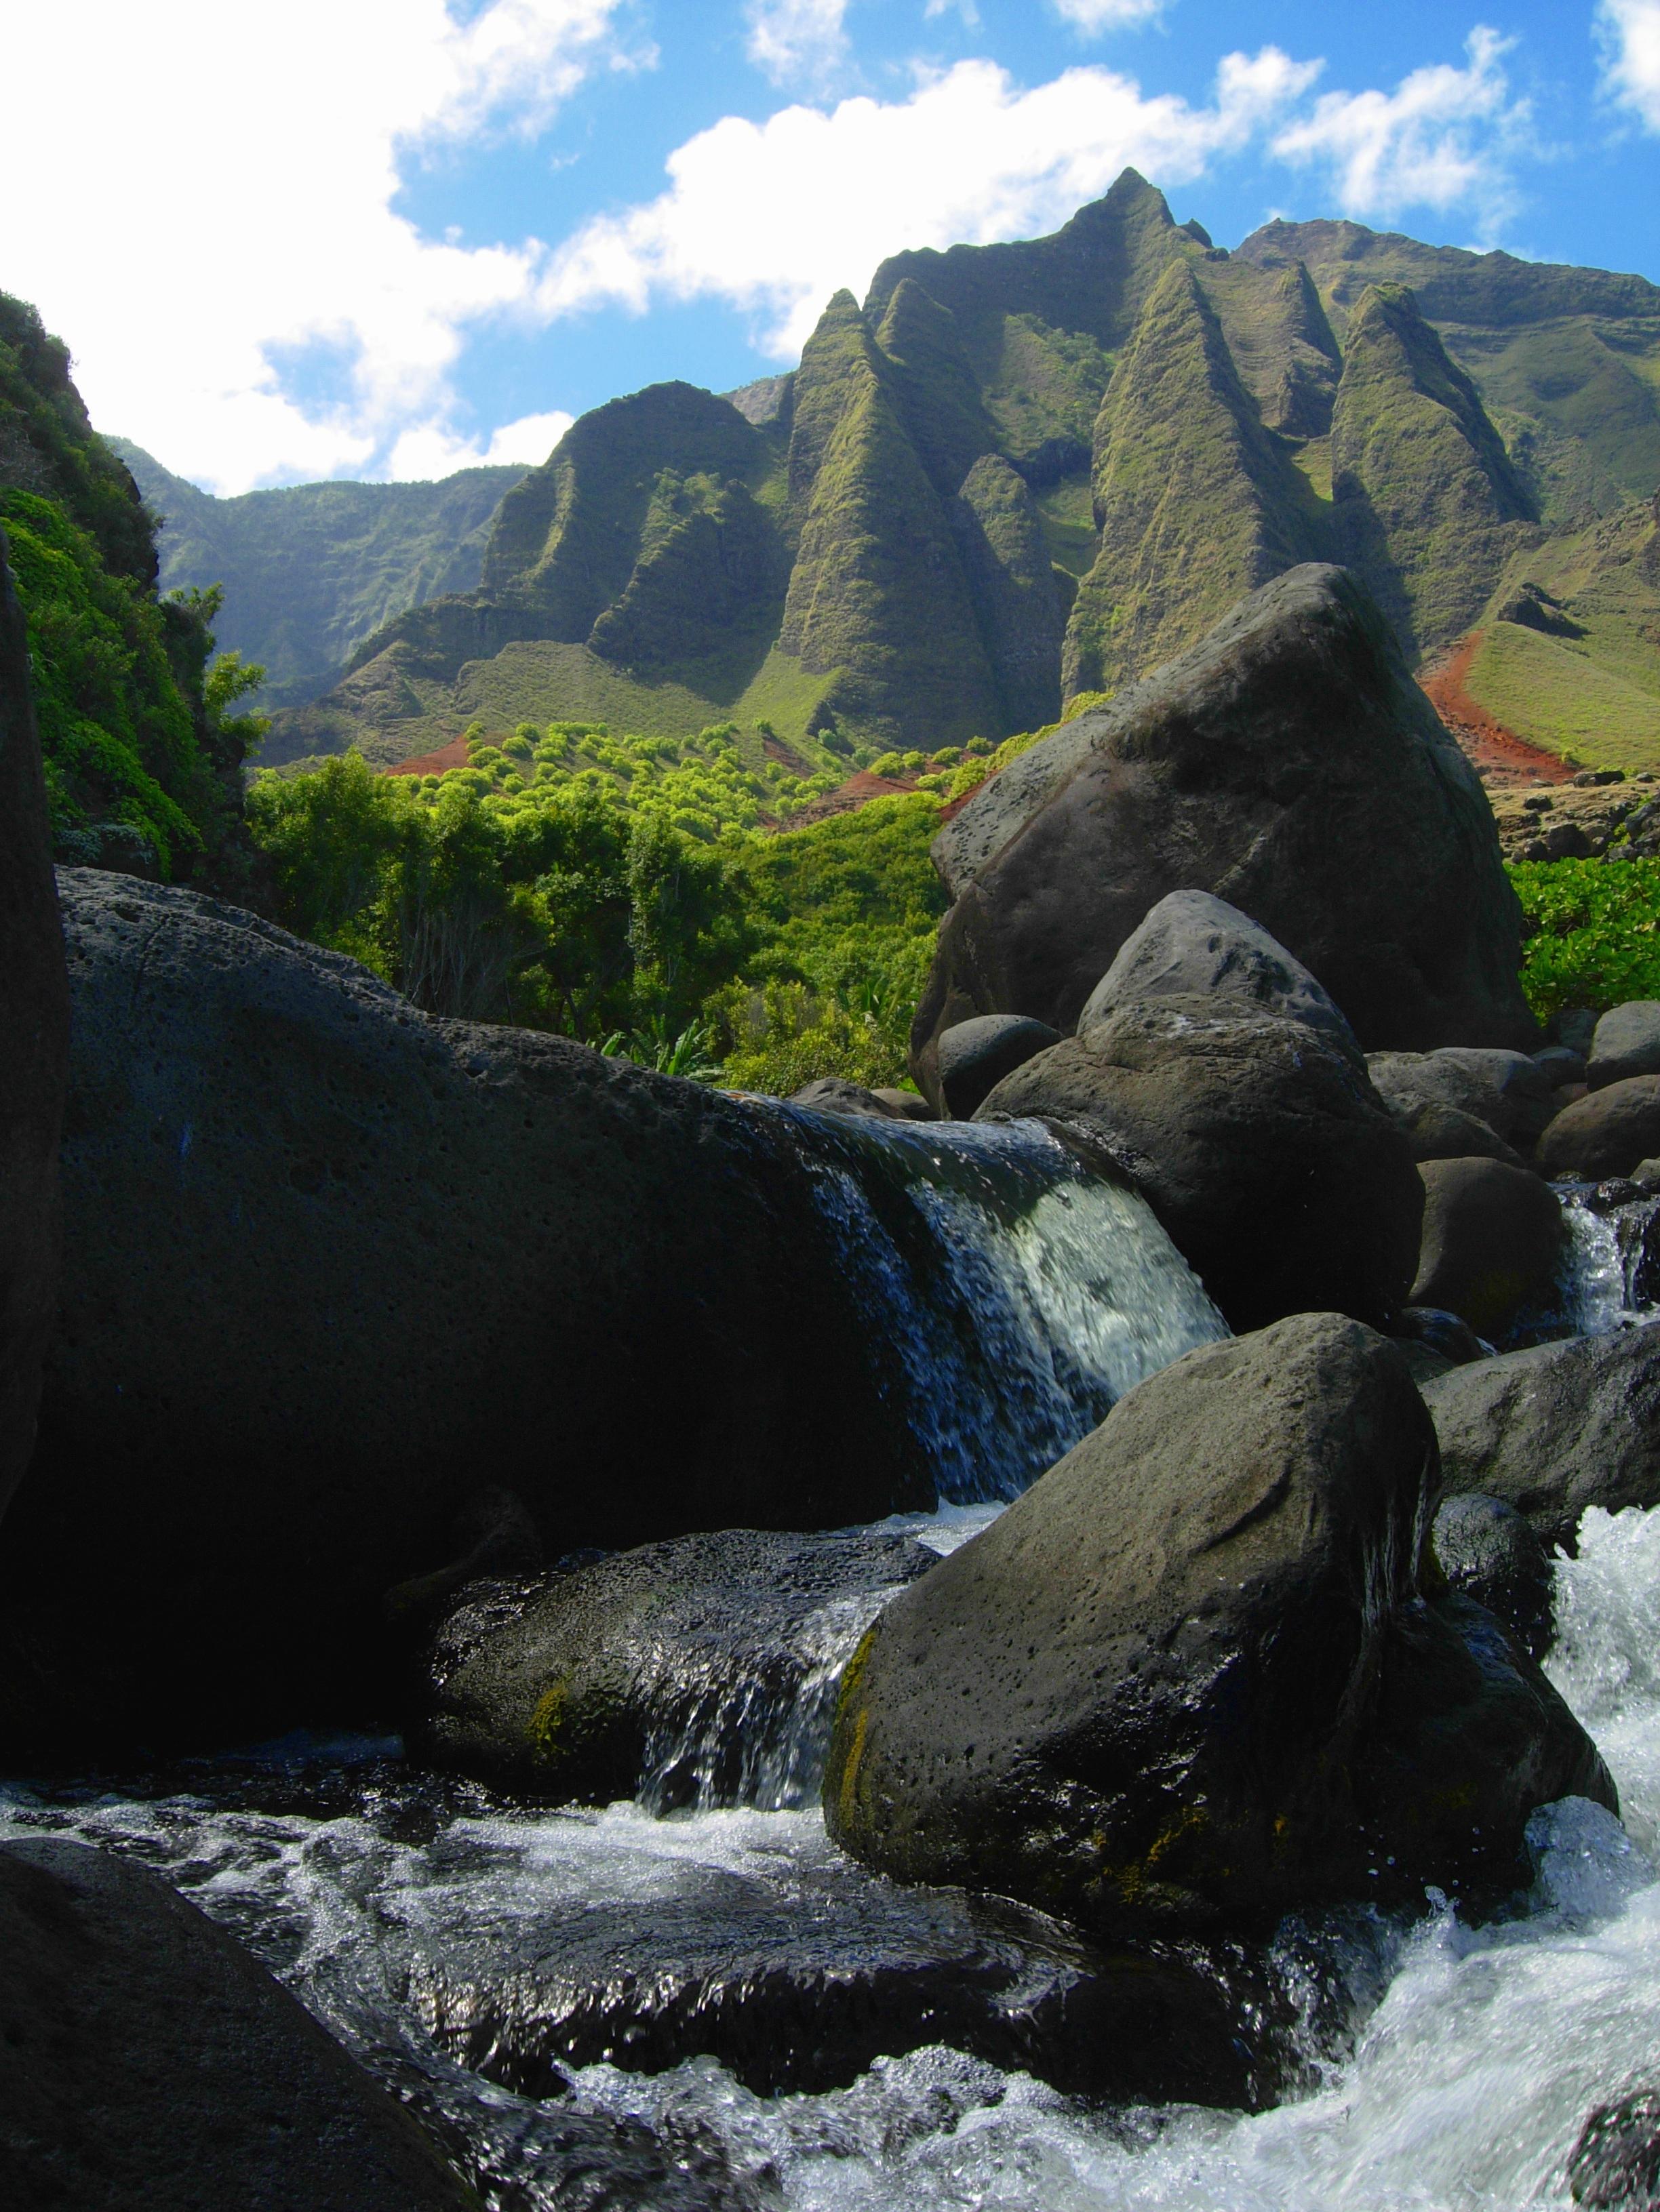 Spirits+of+the+Land+-+Kauai+Shamanism+Nature+Retreat